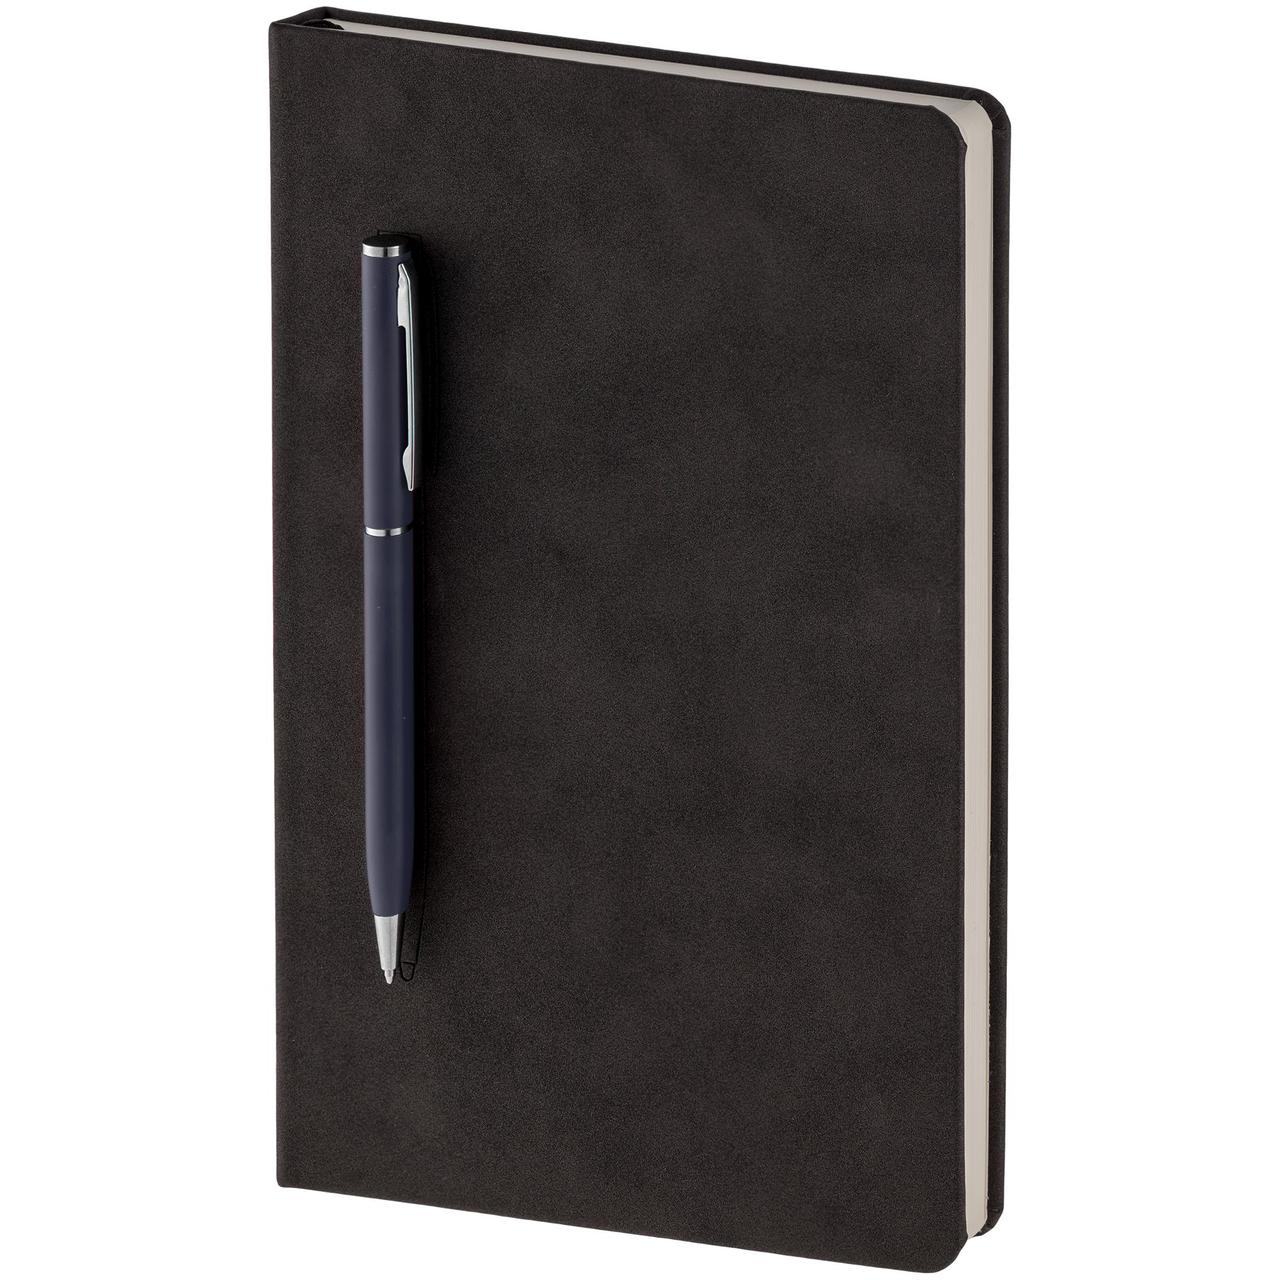 Блокнот Magnet Chrome с ручкой, черно-синий (артикул 15016.40)